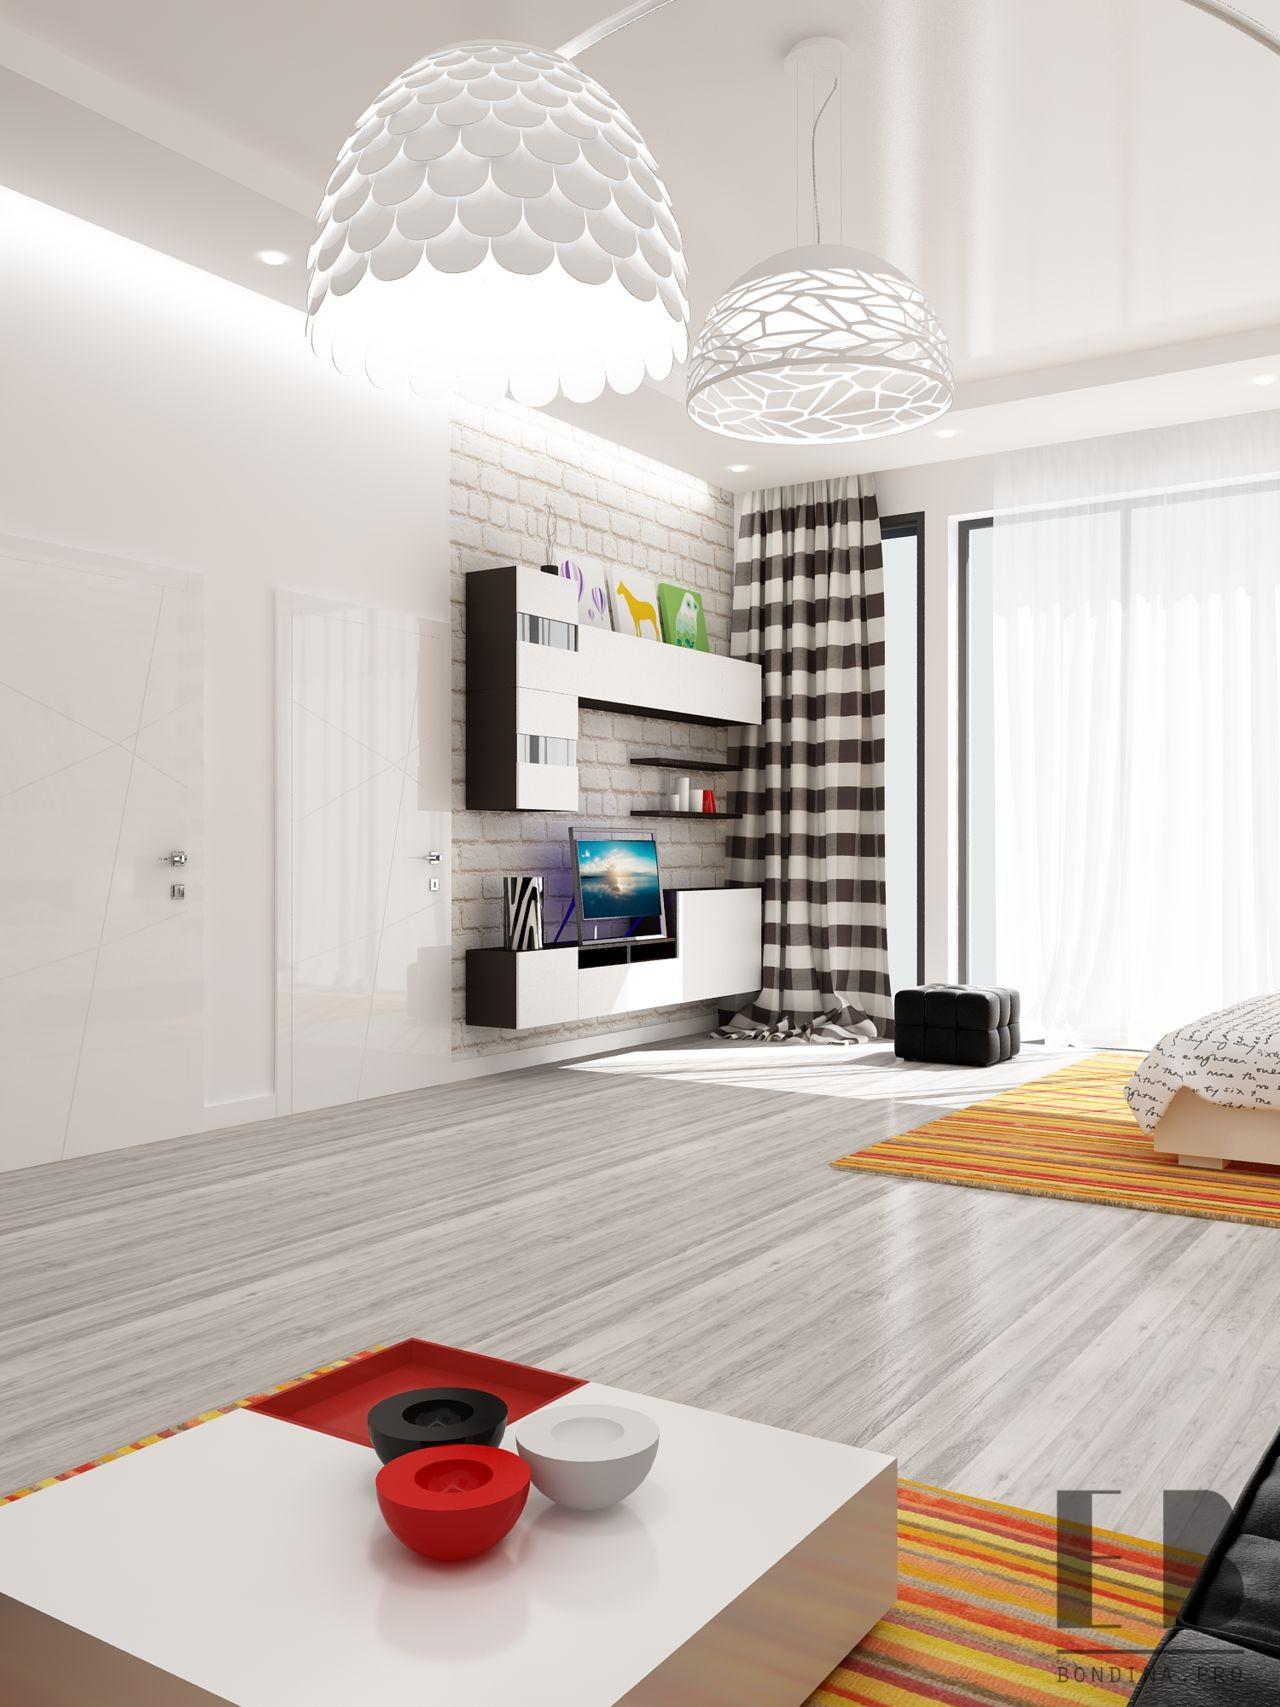 White and black bedroom interior design